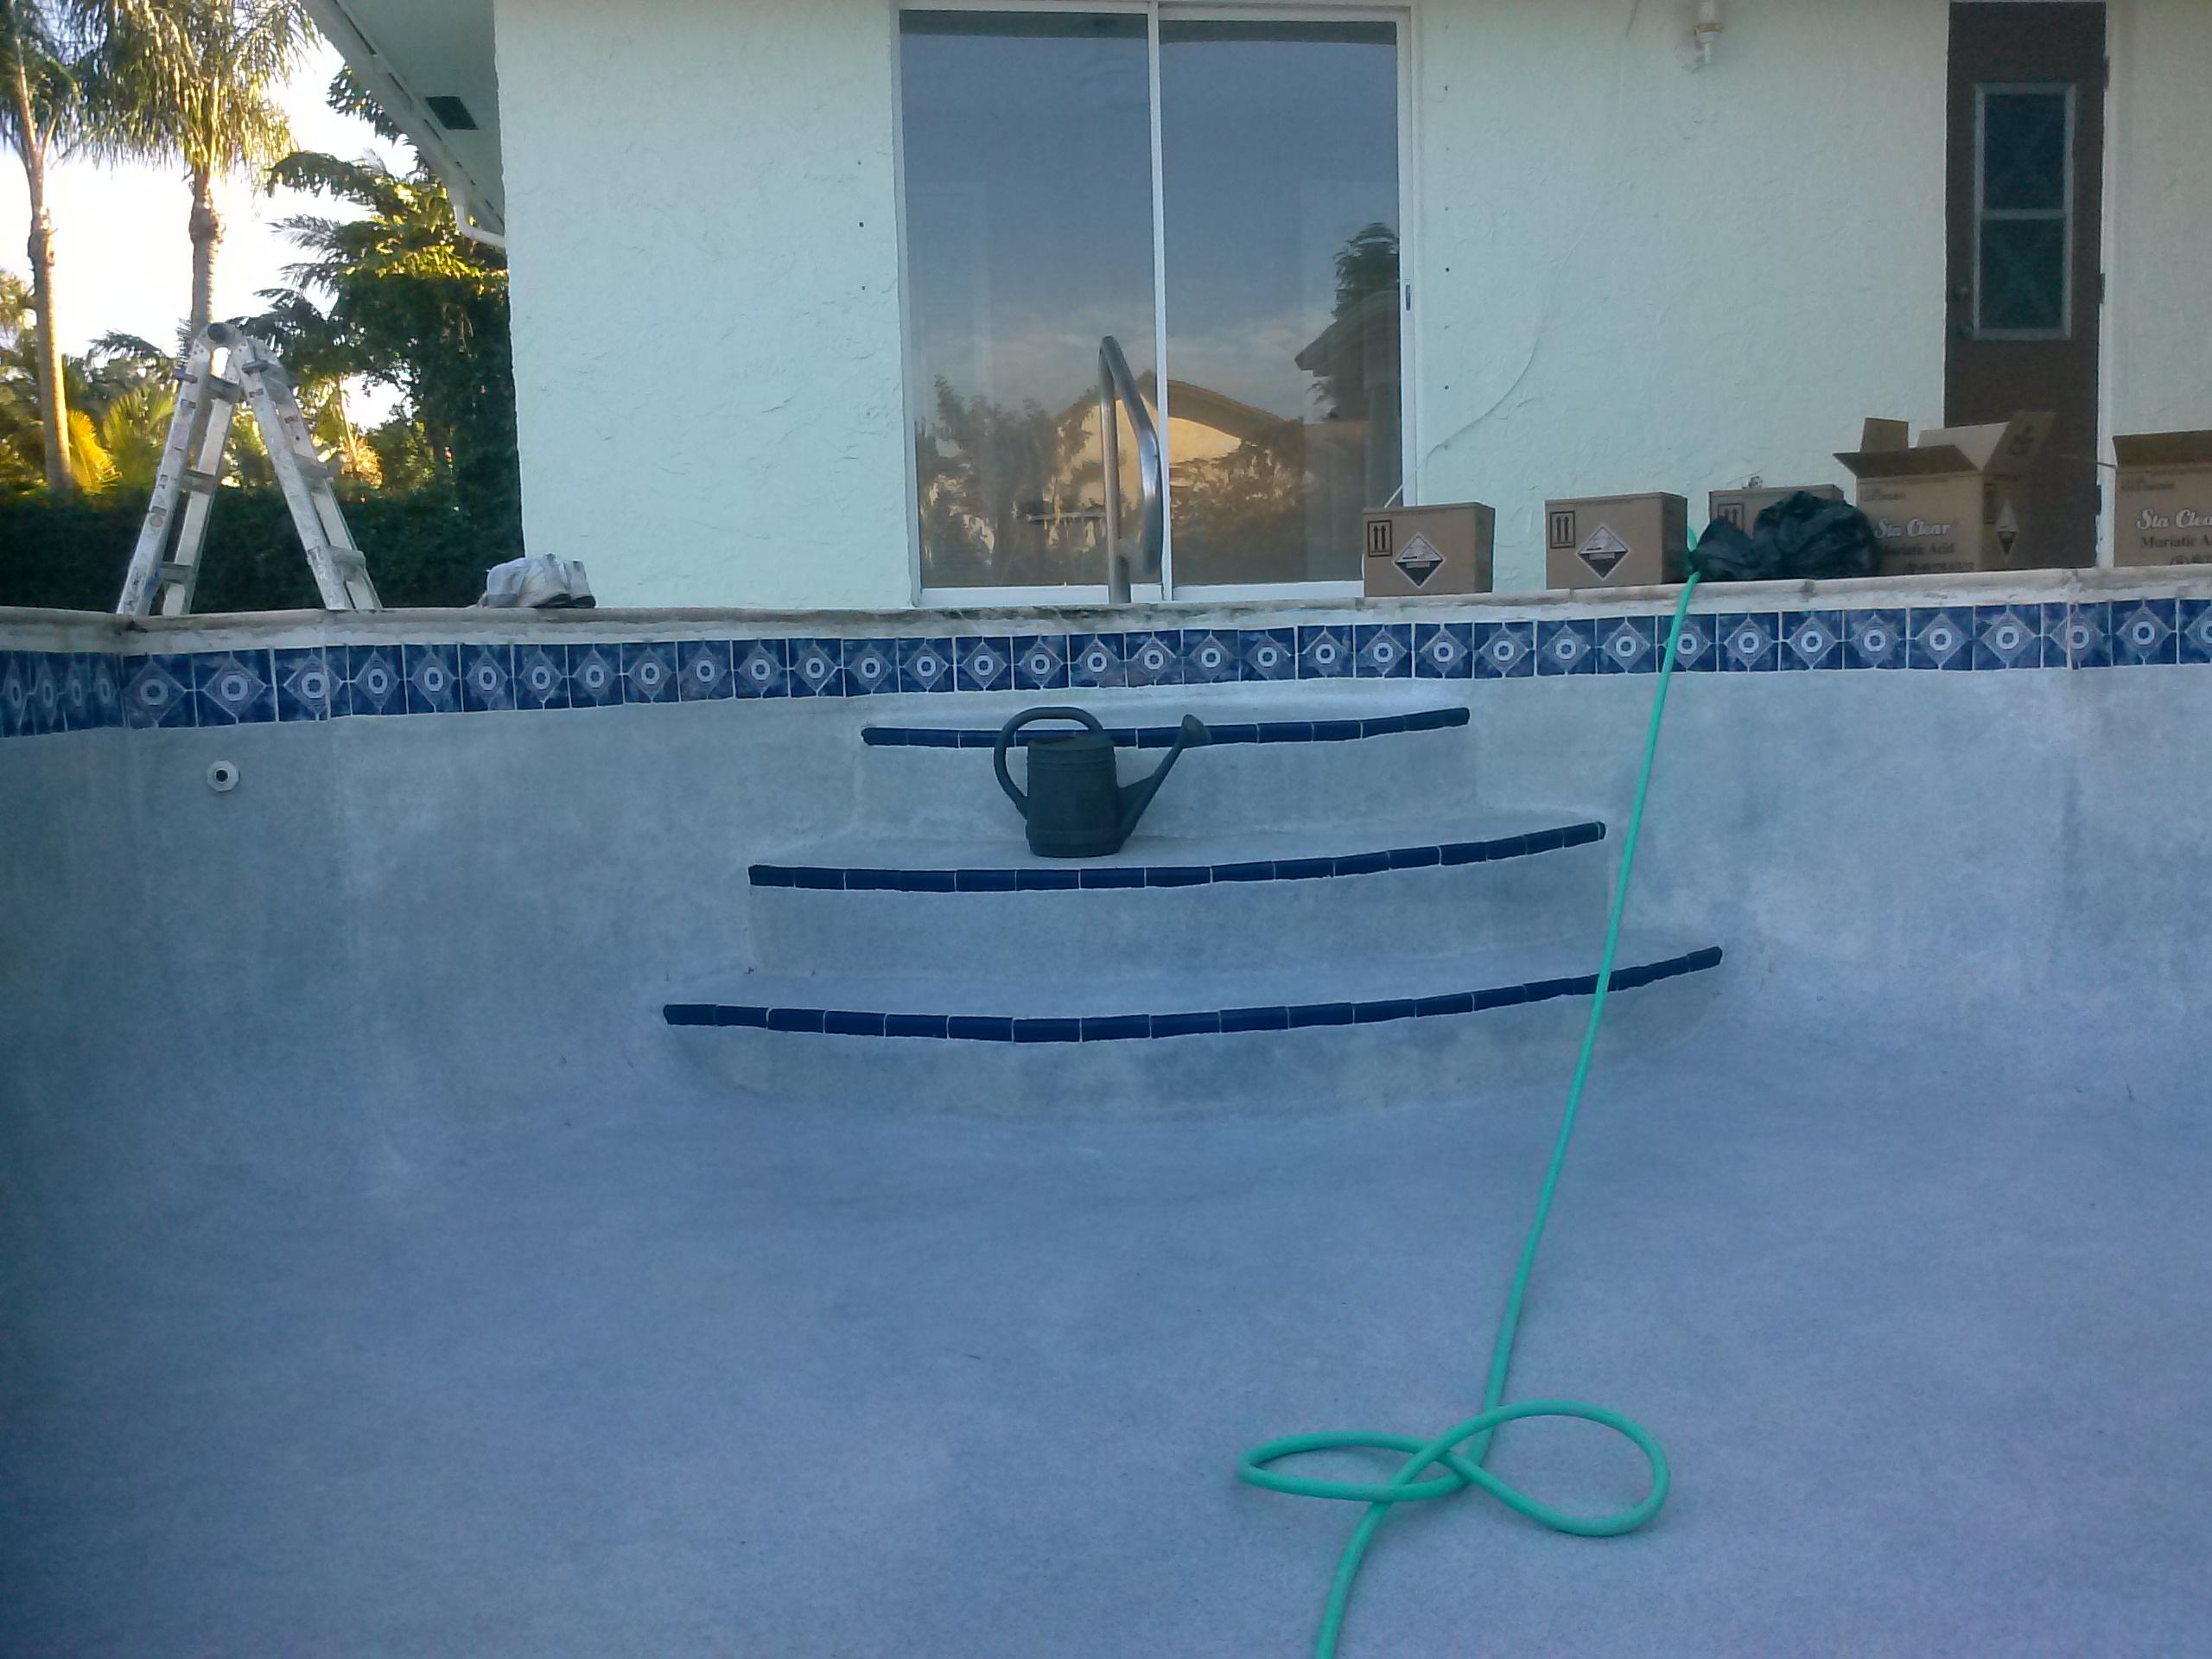 Acid Wash Pool Service : Acid wash photos pool service west palm beach